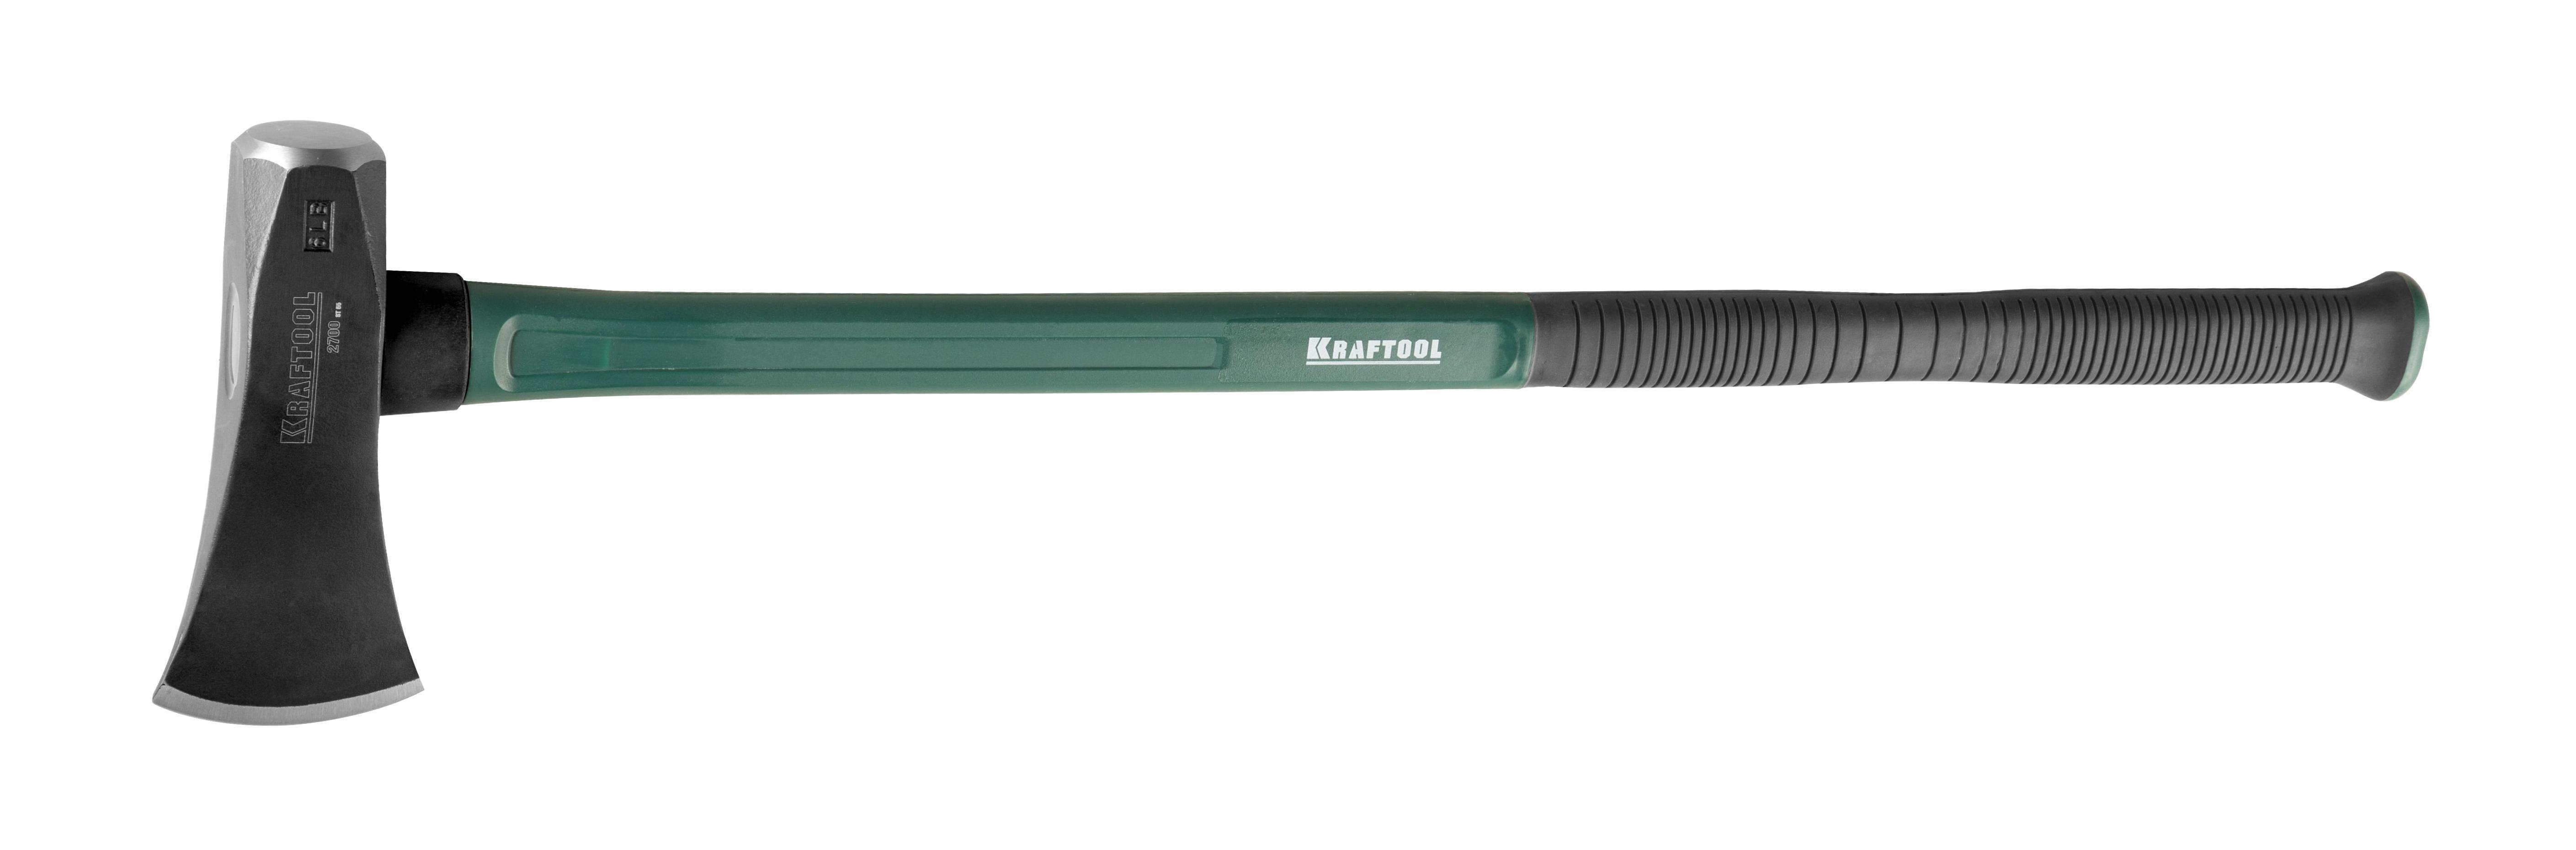 Топор Kraftool 20657-27 топор туристический truper 14951